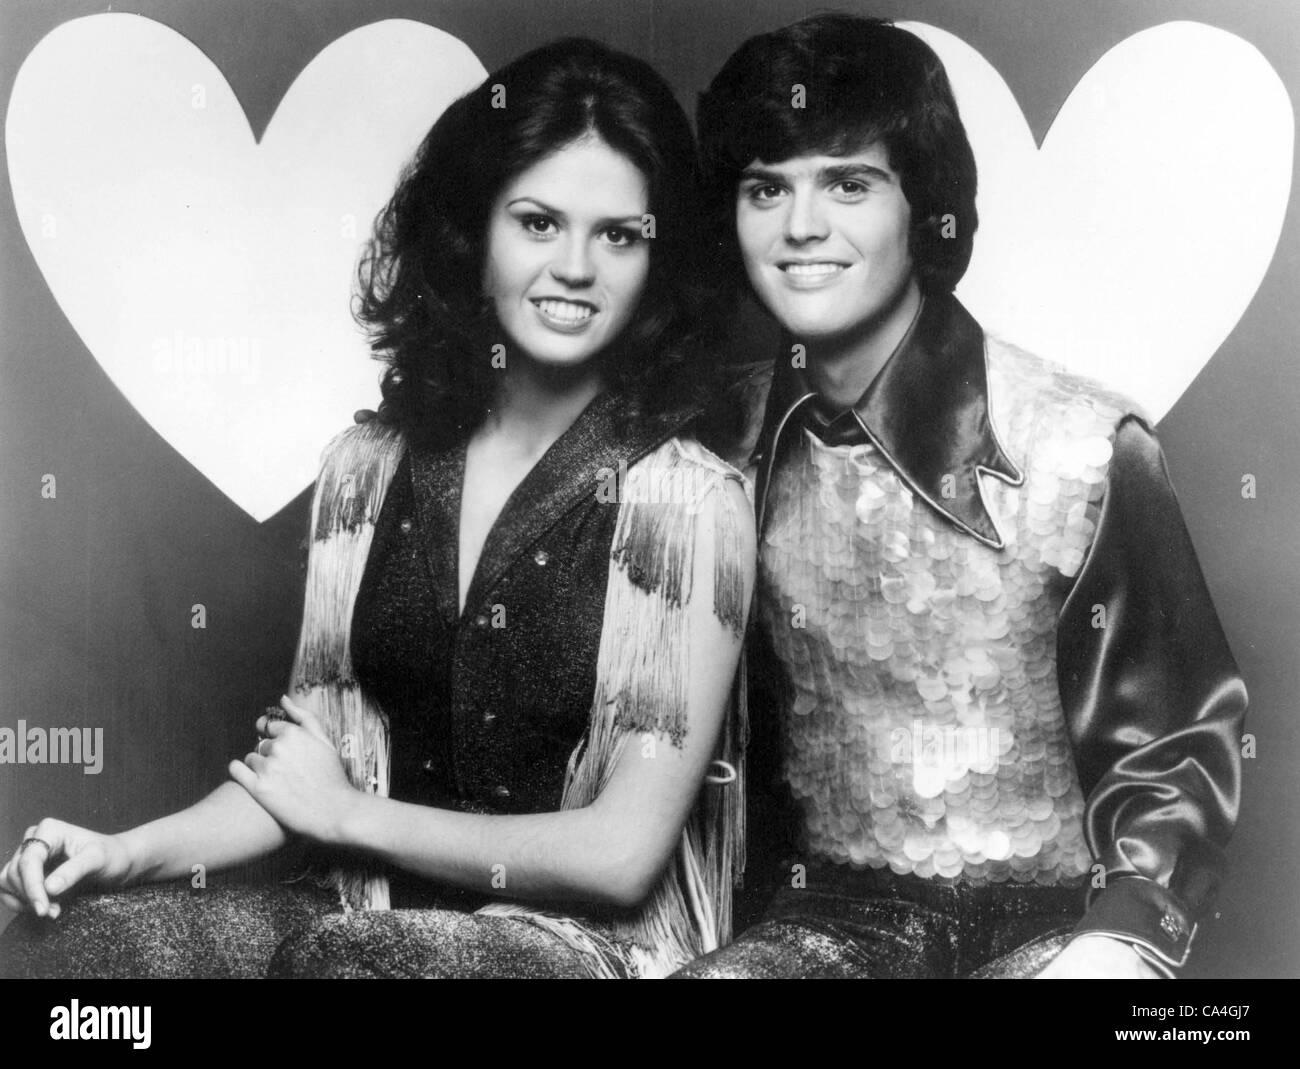 DONNY AND MARIE OSMOND.TV-FILM STILL.(Credit Image: © Globe Photos/ZUMAPRESS.com) - Stock Image